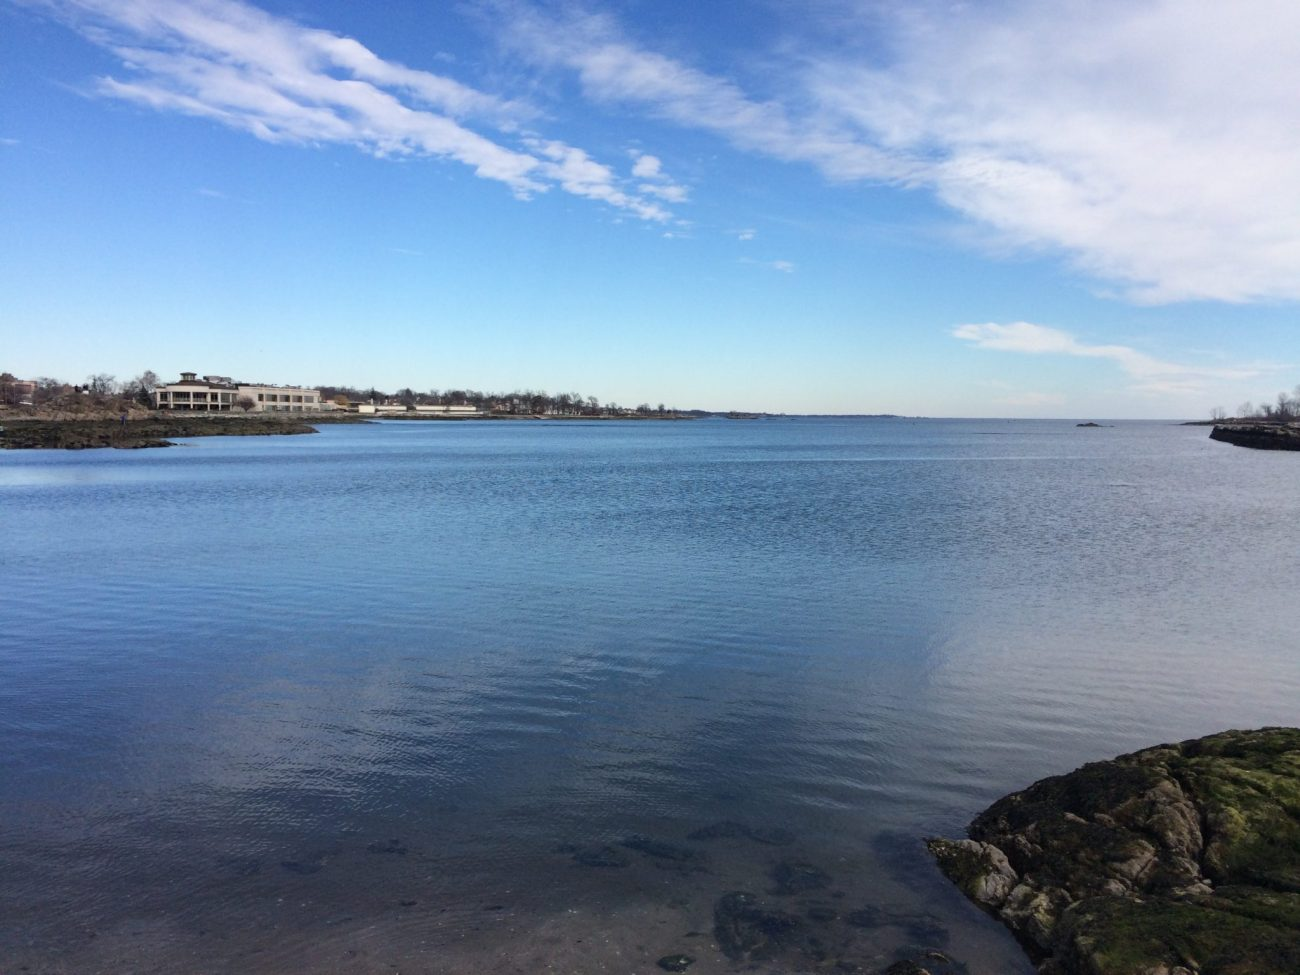 glen-island-on-long-island-sound-in-new-york